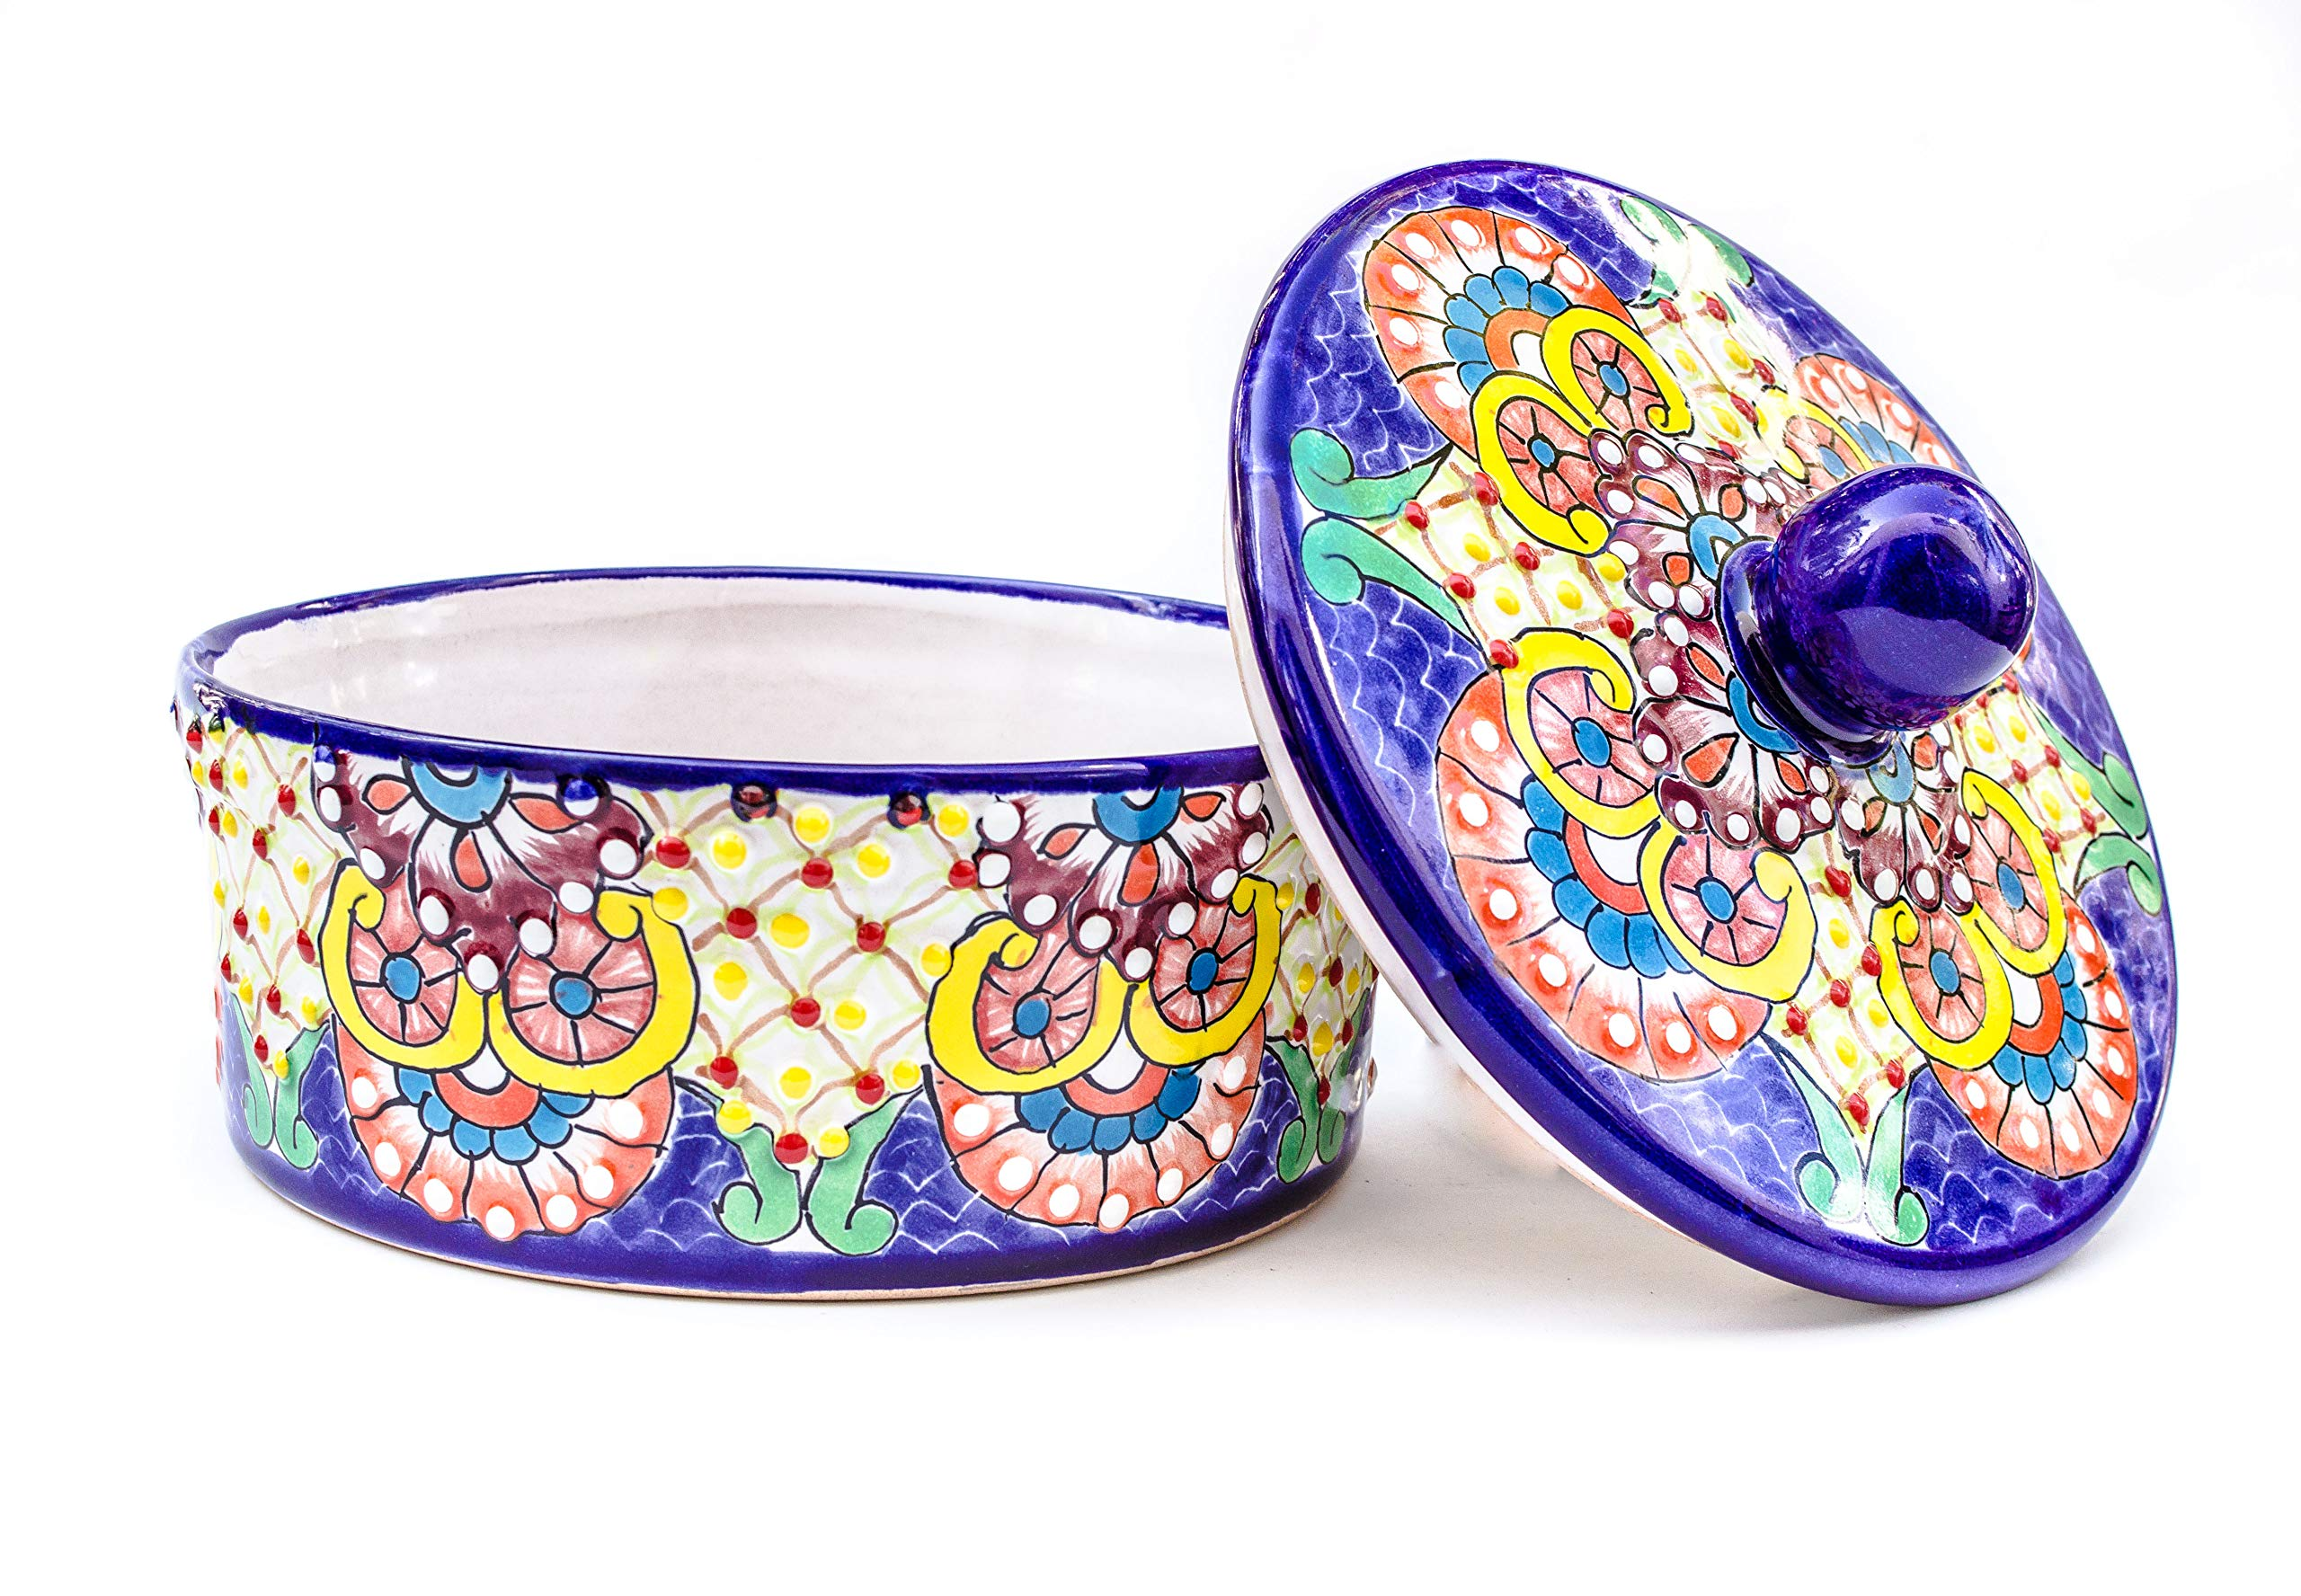 Unique Mexican Blue Ceramic Tortilla Warmer Pancake Holder Talavera Pottery 8 in diameter. Tortilla Storage Container can also be used for Roti Warmer, Soft Taco Shell Quesadilla Burrito Warmer.